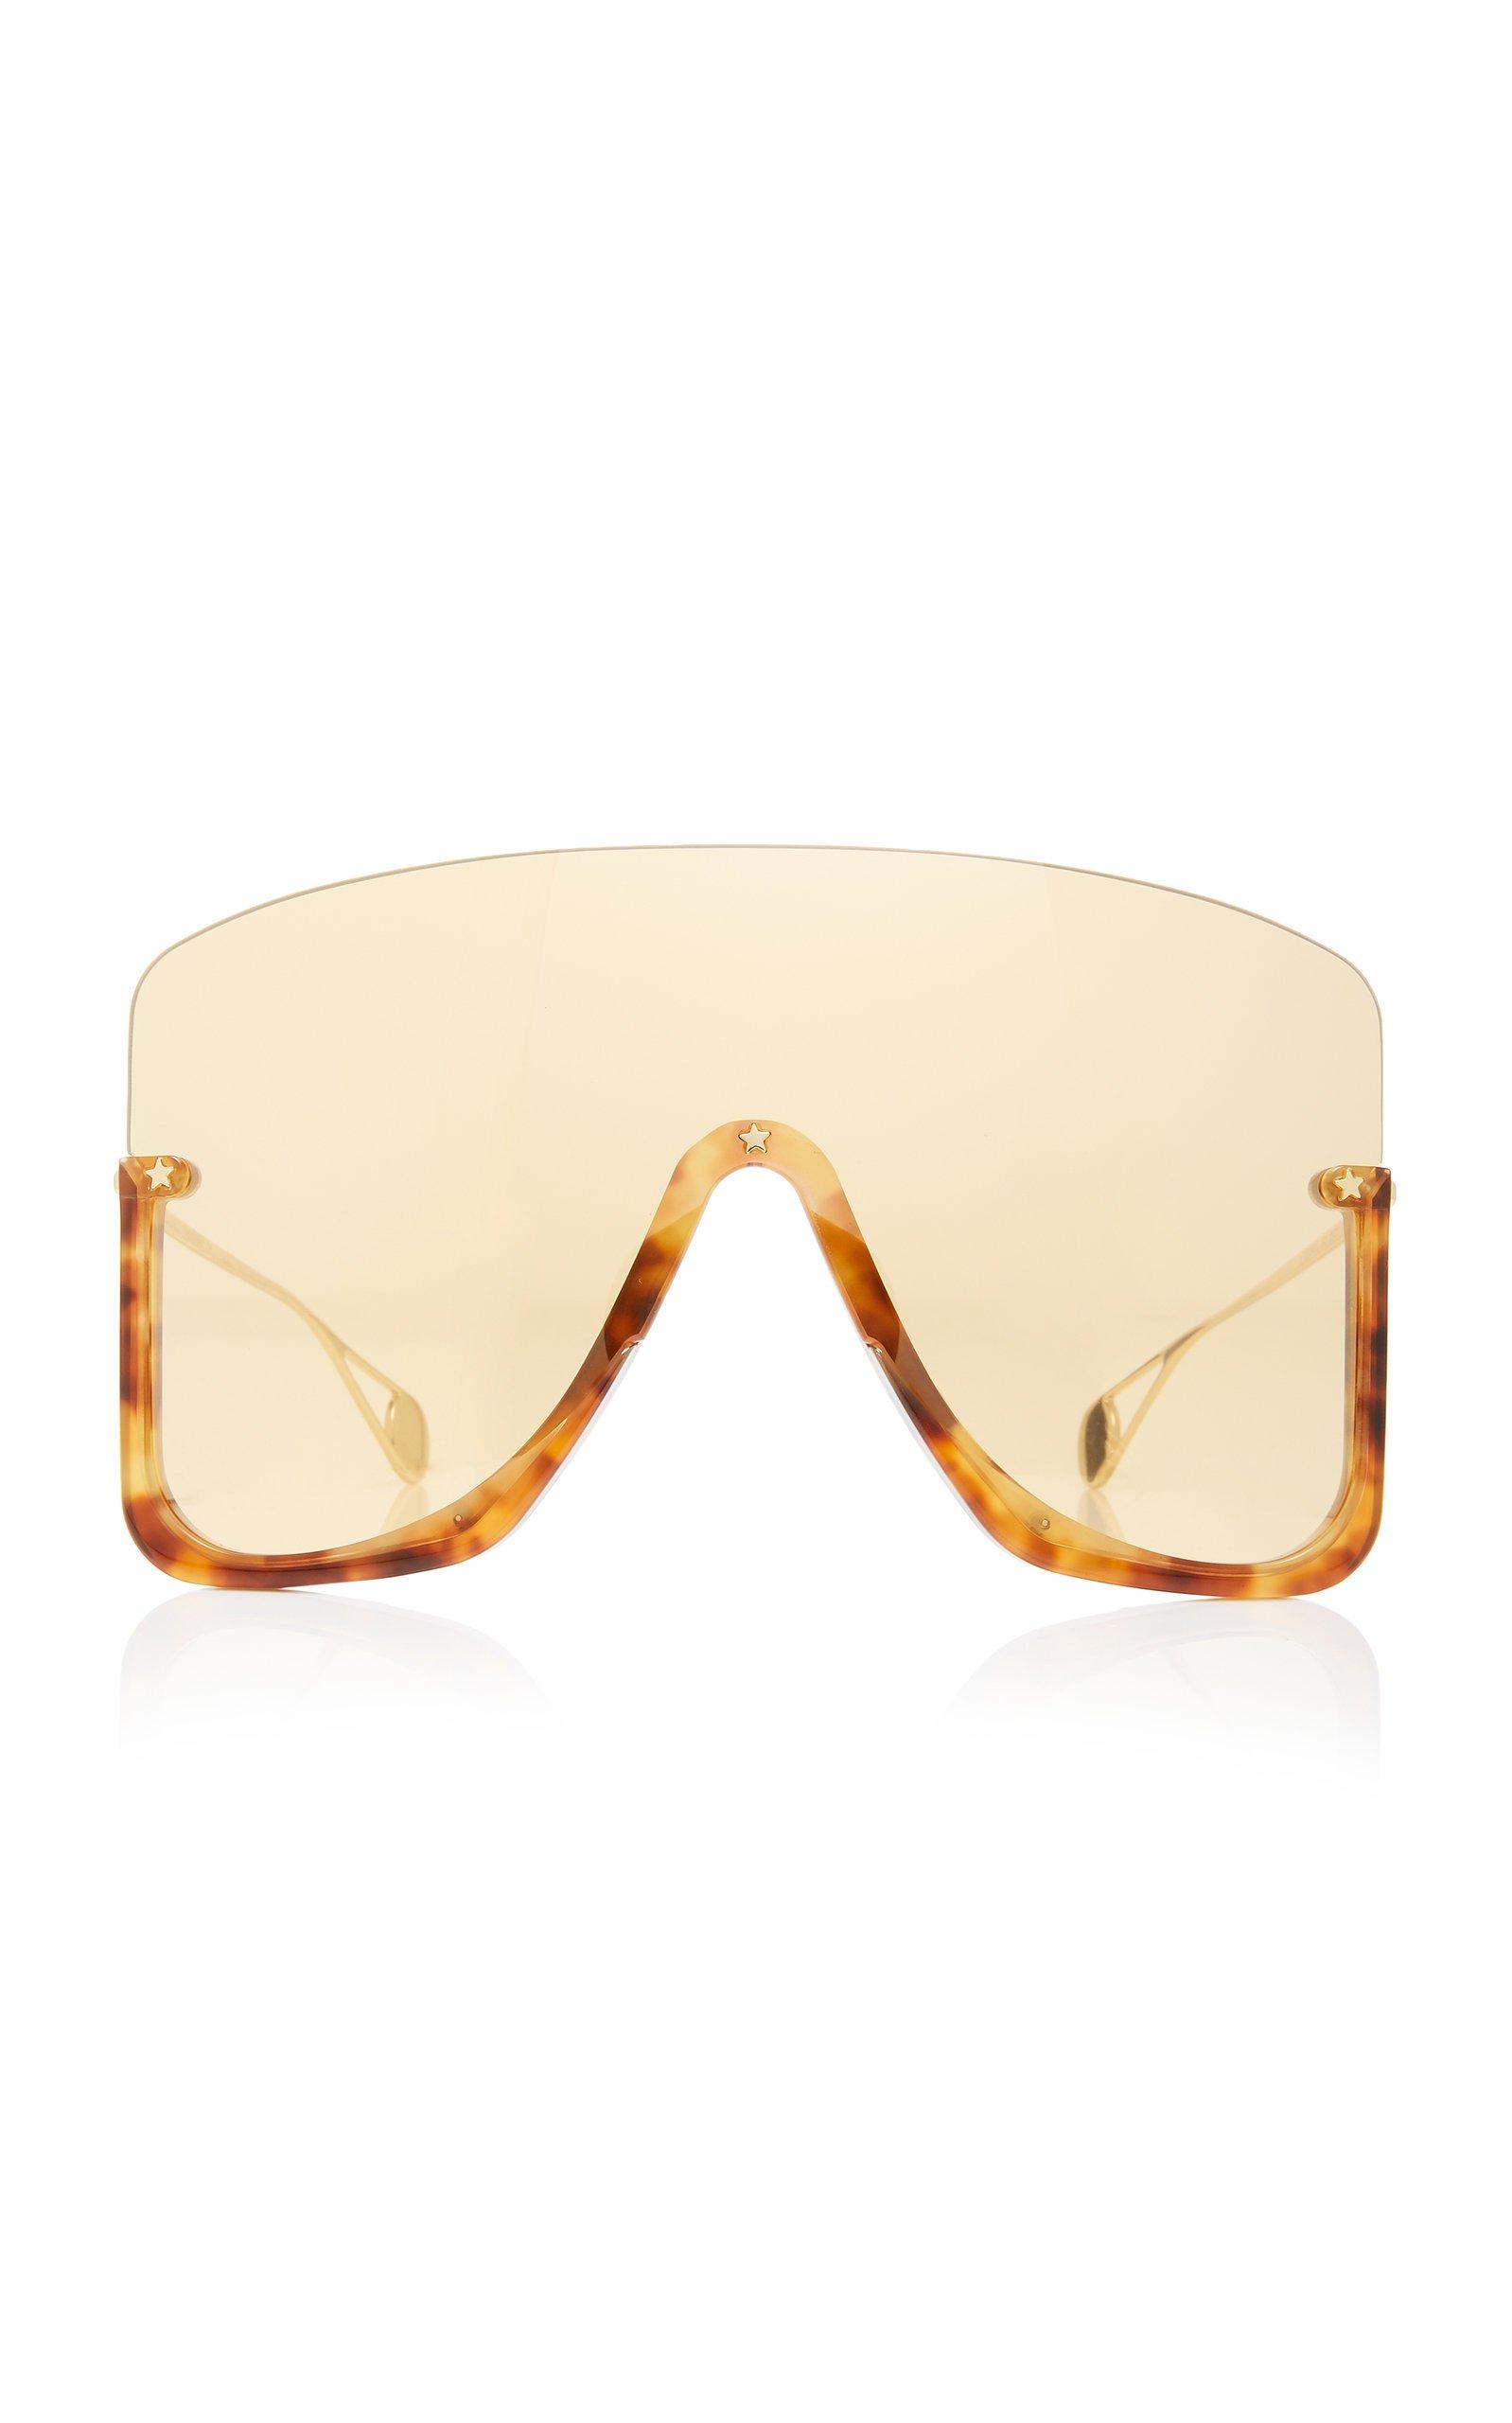 Oversized Acetate Shield Sunglasses by Gucci Sunglasses | Moda Operandi